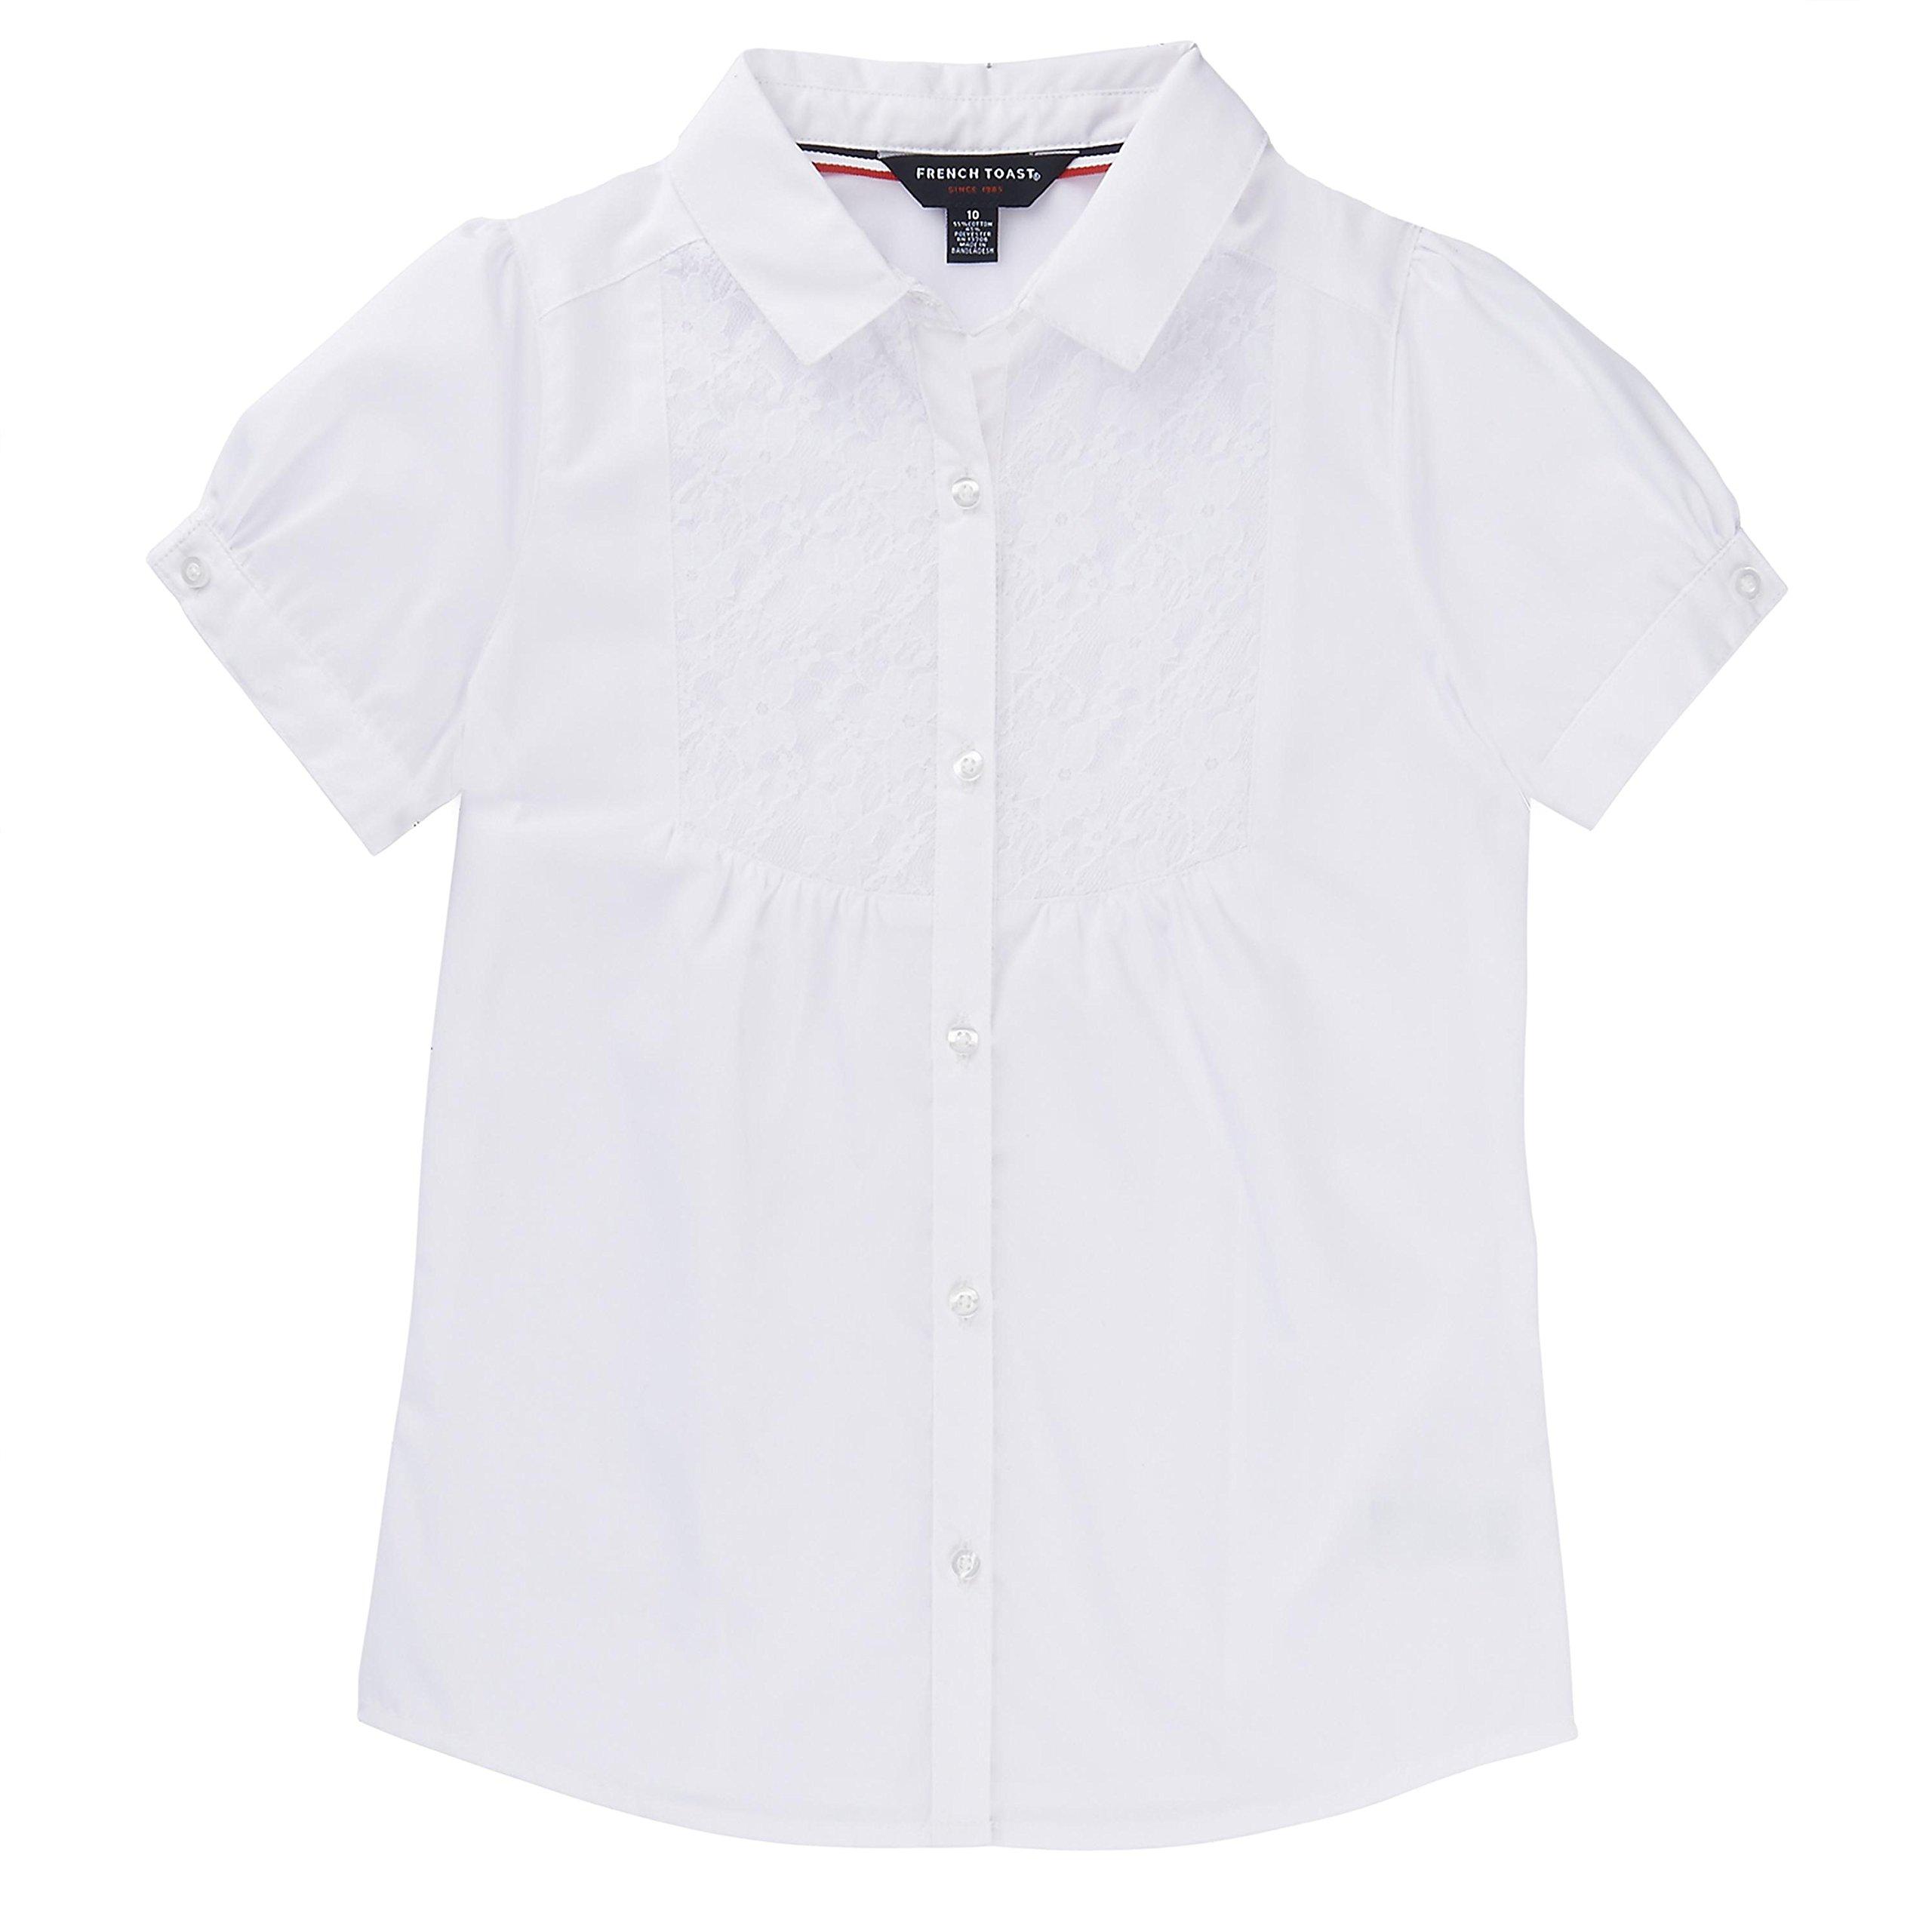 French Toast School Uniform Girls Short Sleeve Bib-Front Lace Blouse, White, 4